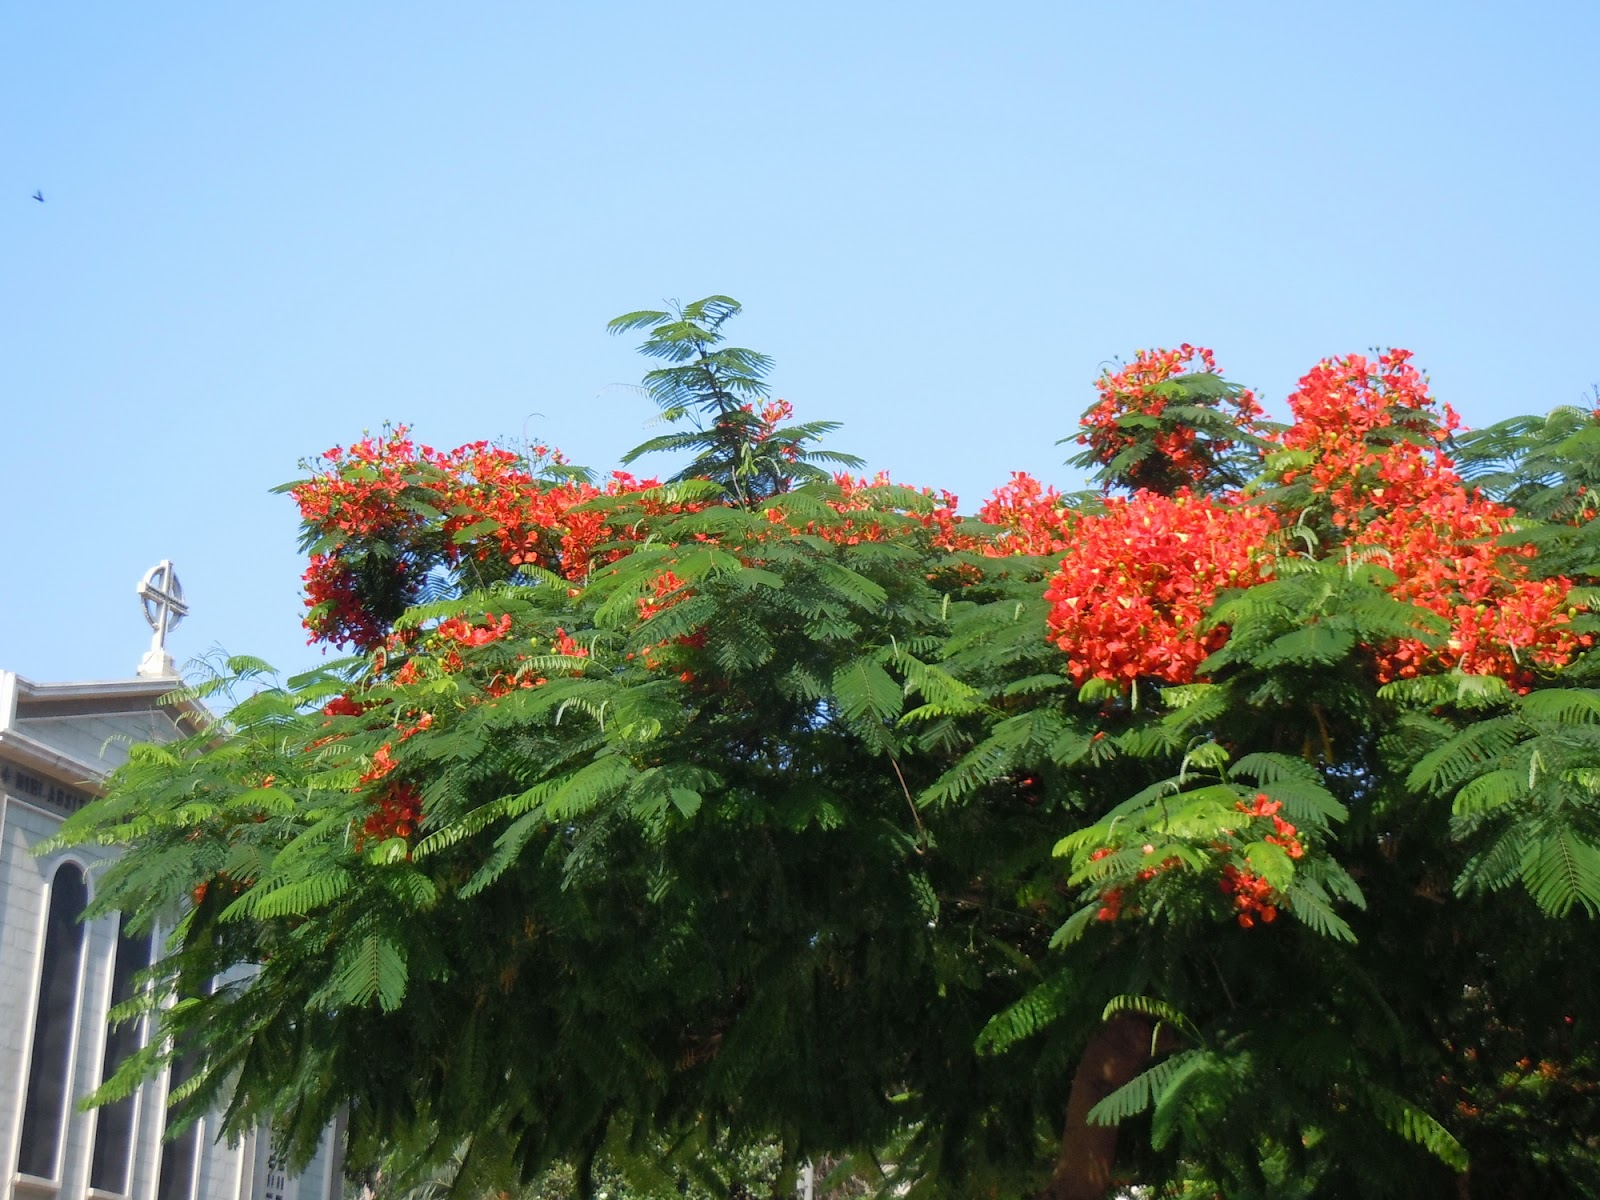 Sans gluten beyrouth du flamboyant beyrouth hamra rouge - Arbres a fleurs rouges ...